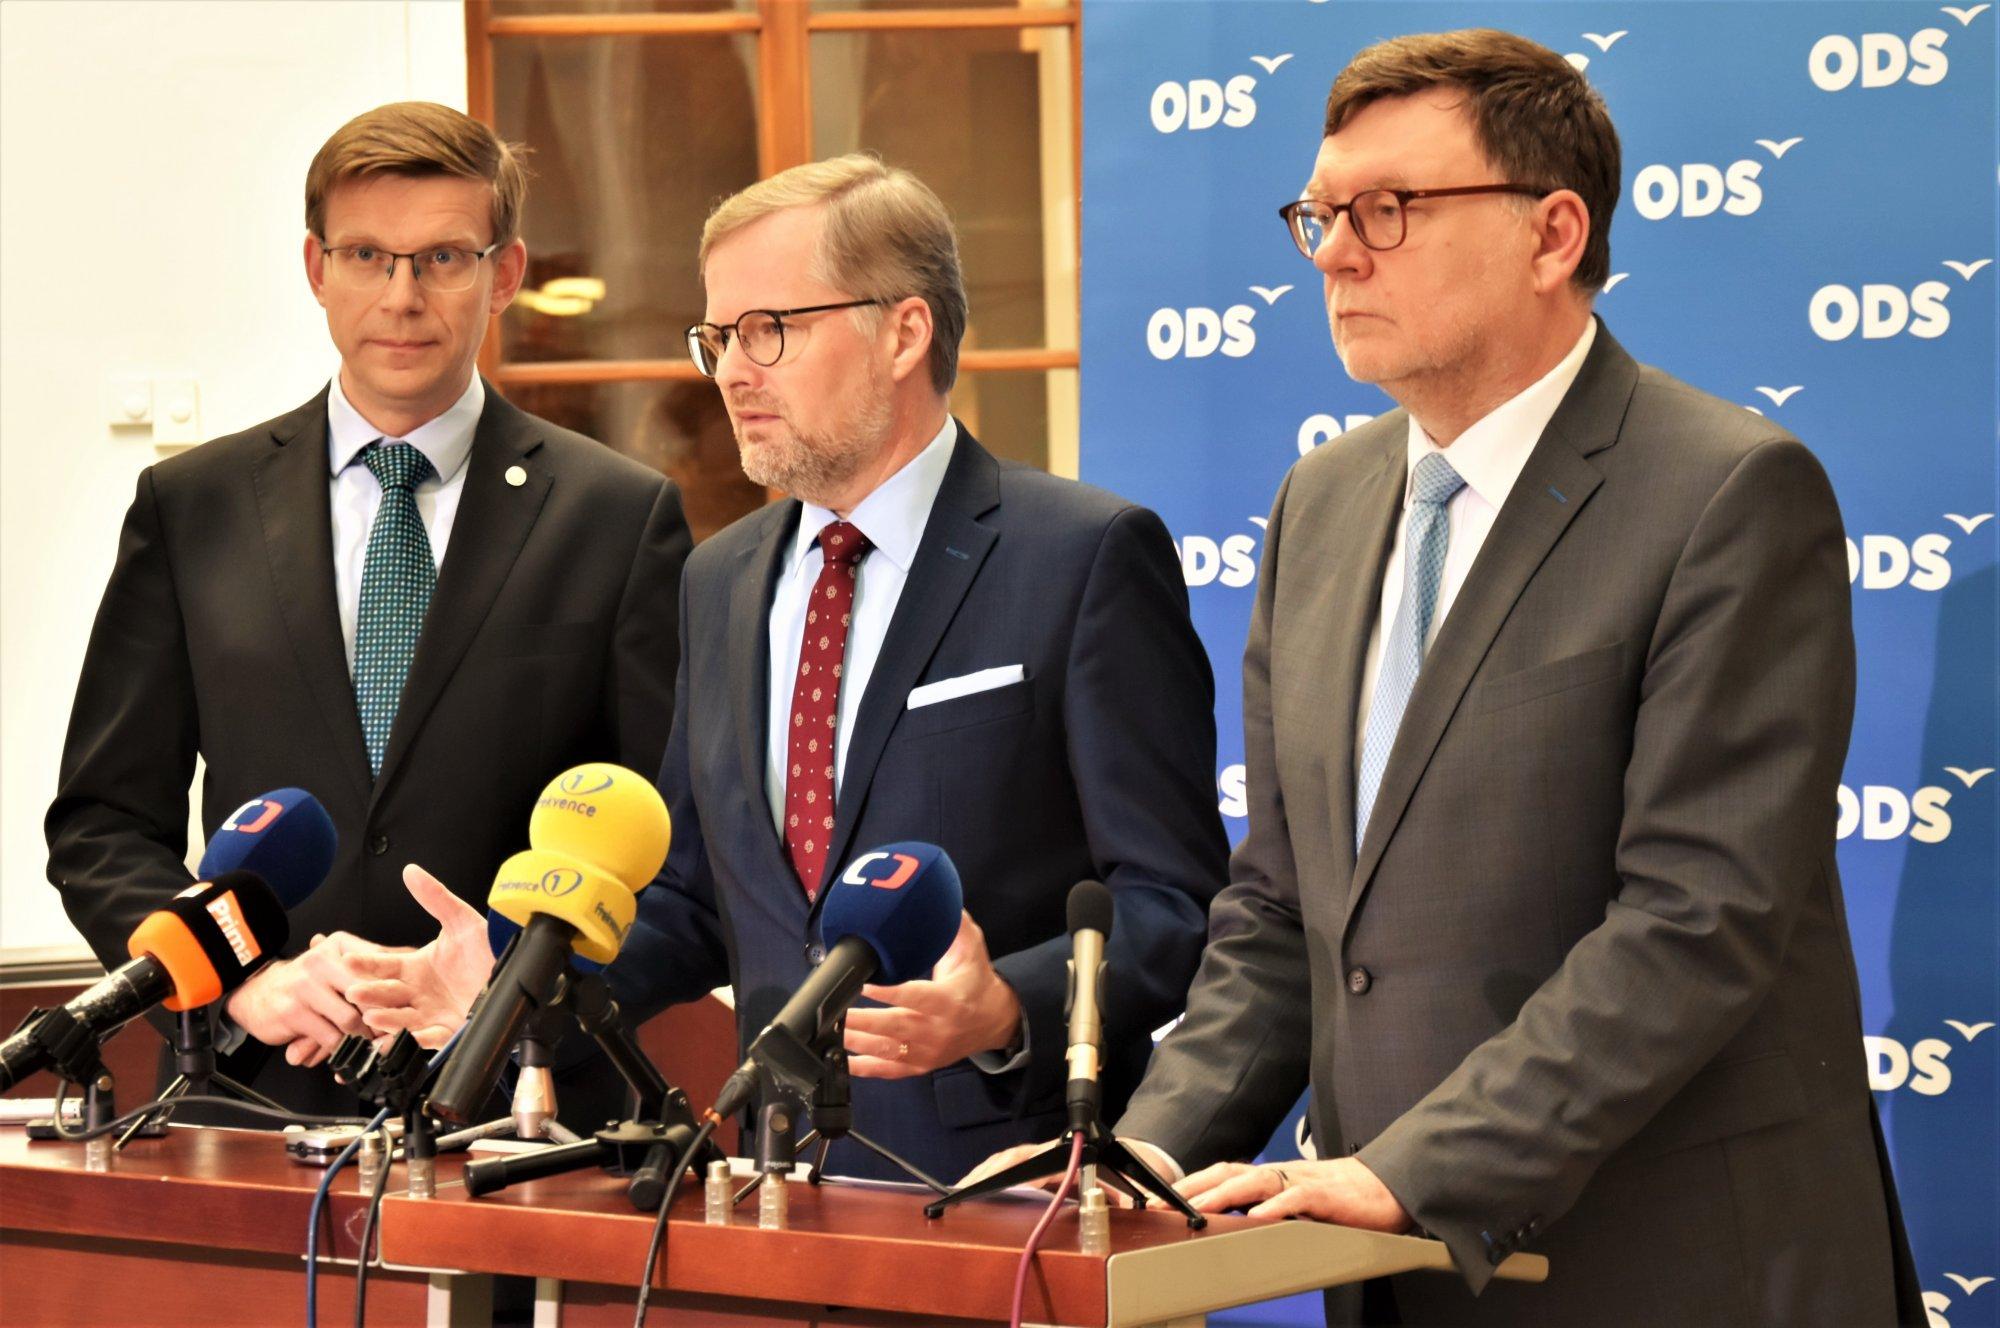 ODS: Stát chce, aby občané plnili svoje povinnosti včas, sám v tom ale selhává. Navrhujeme fikci souhlasu, která urychlí veškerou výstavbu v ČR